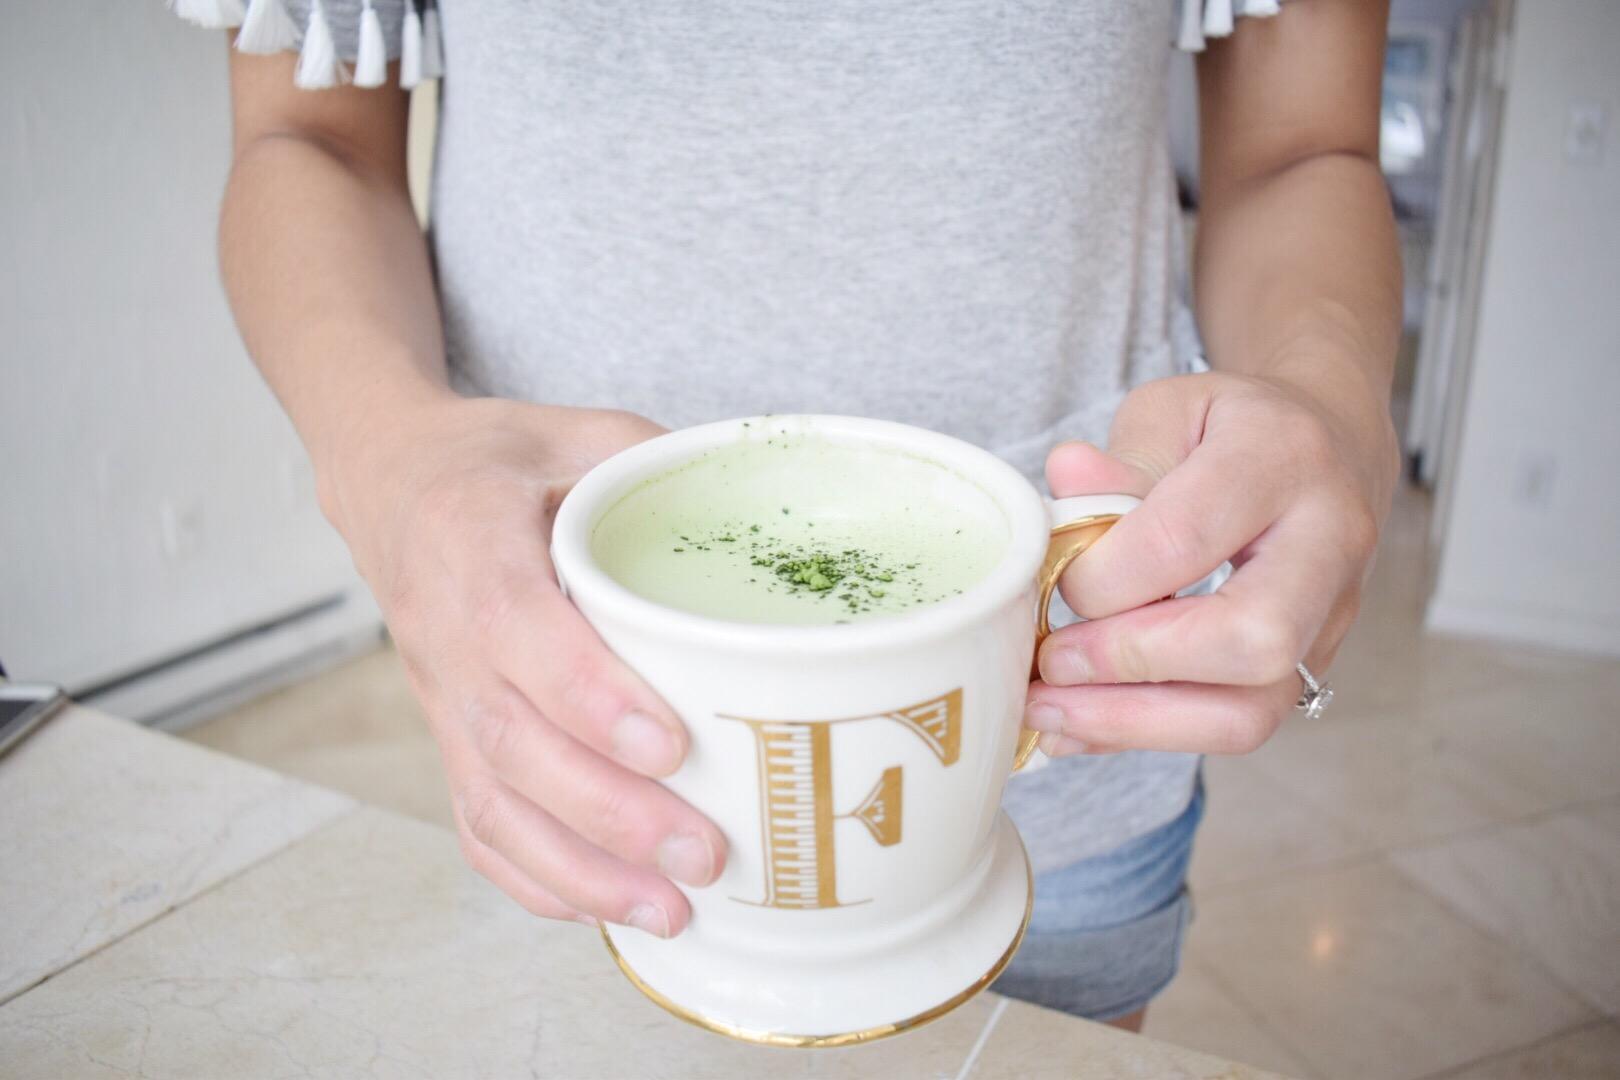 DIY Matcha Latte Drink At Home 7.jpg